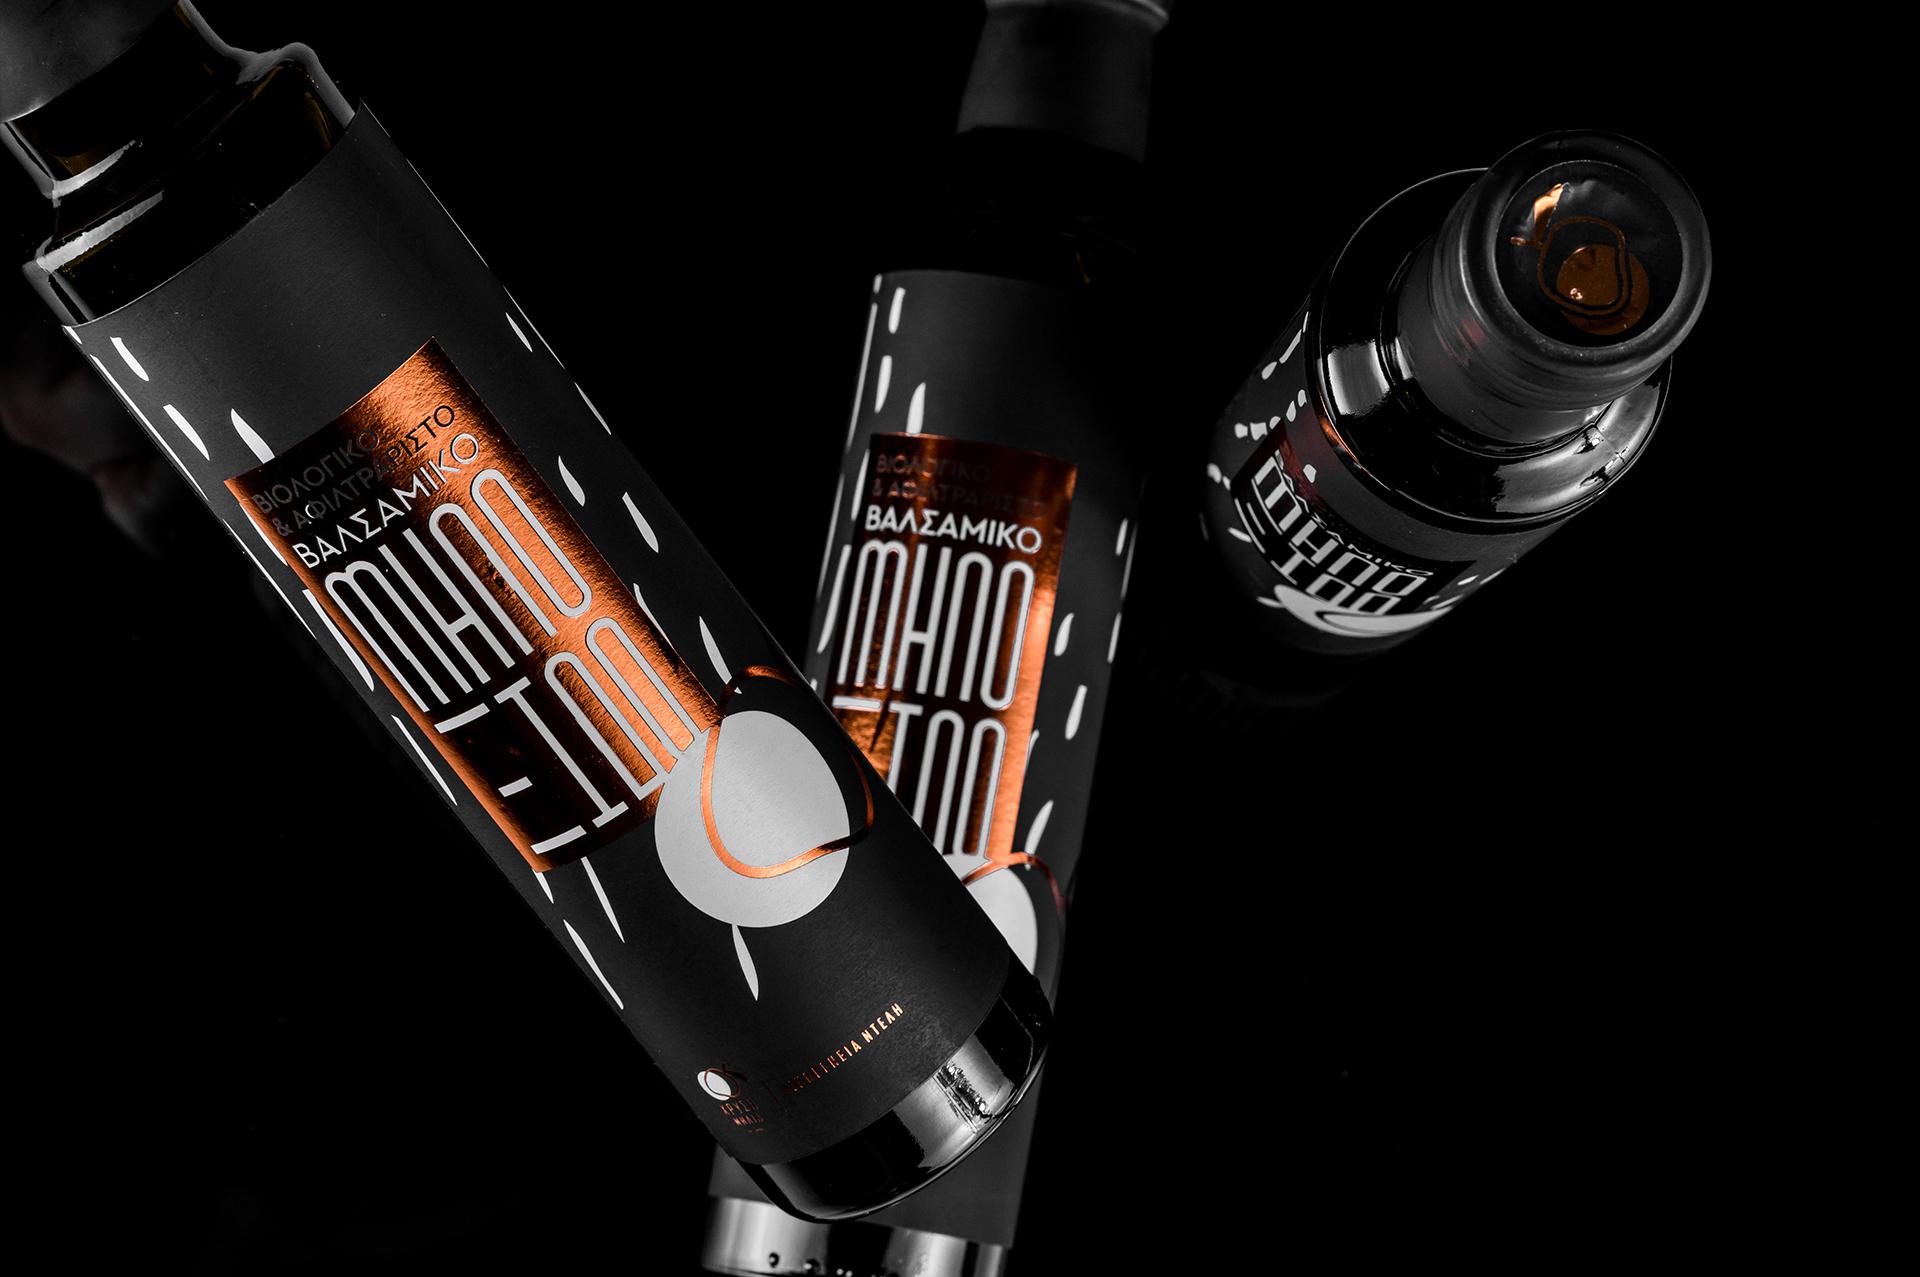 Chrysi Milia, The Balsam Apple Cider Vinegar Designed by Sowl Creative Studio